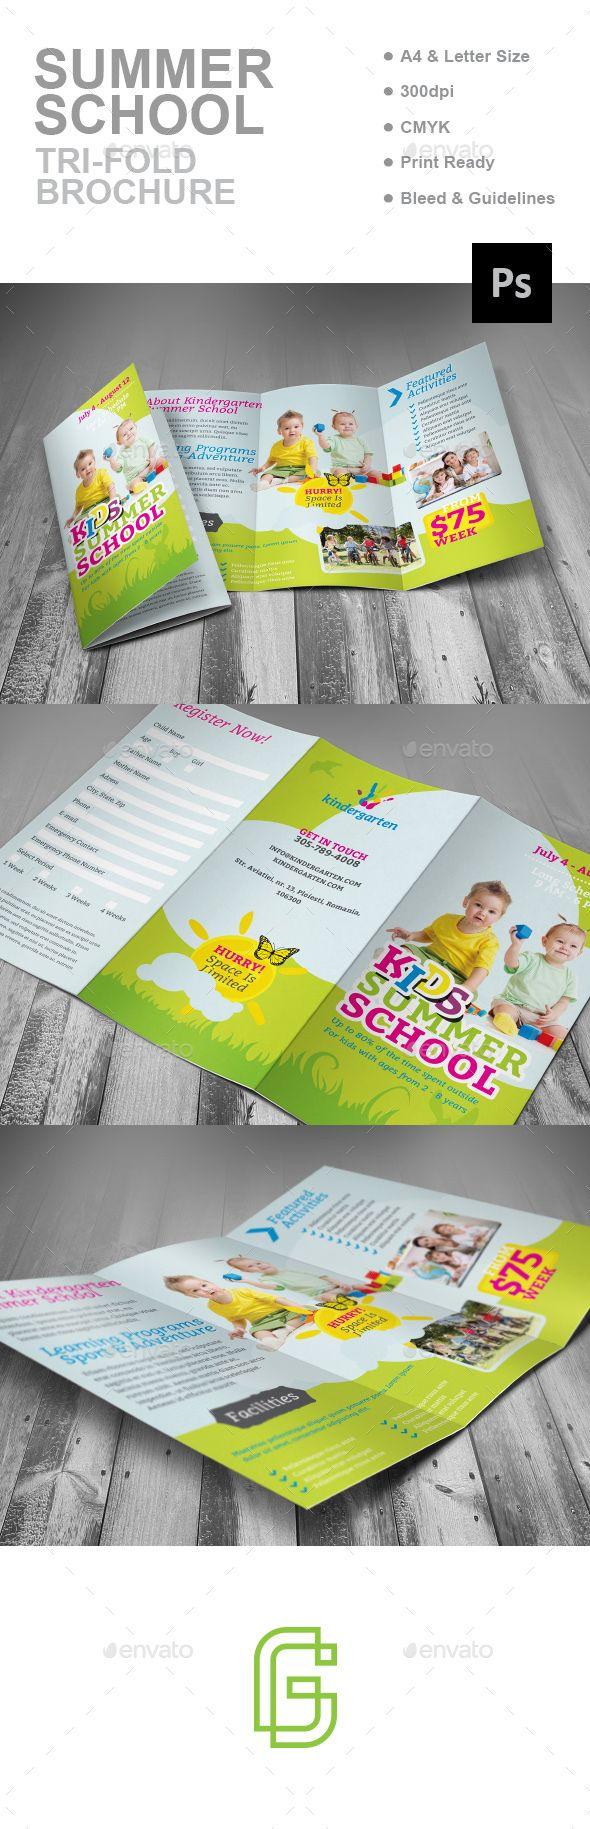 Summer School Trifold Brochure Design Template - Corporate Brochures  Template Psd.